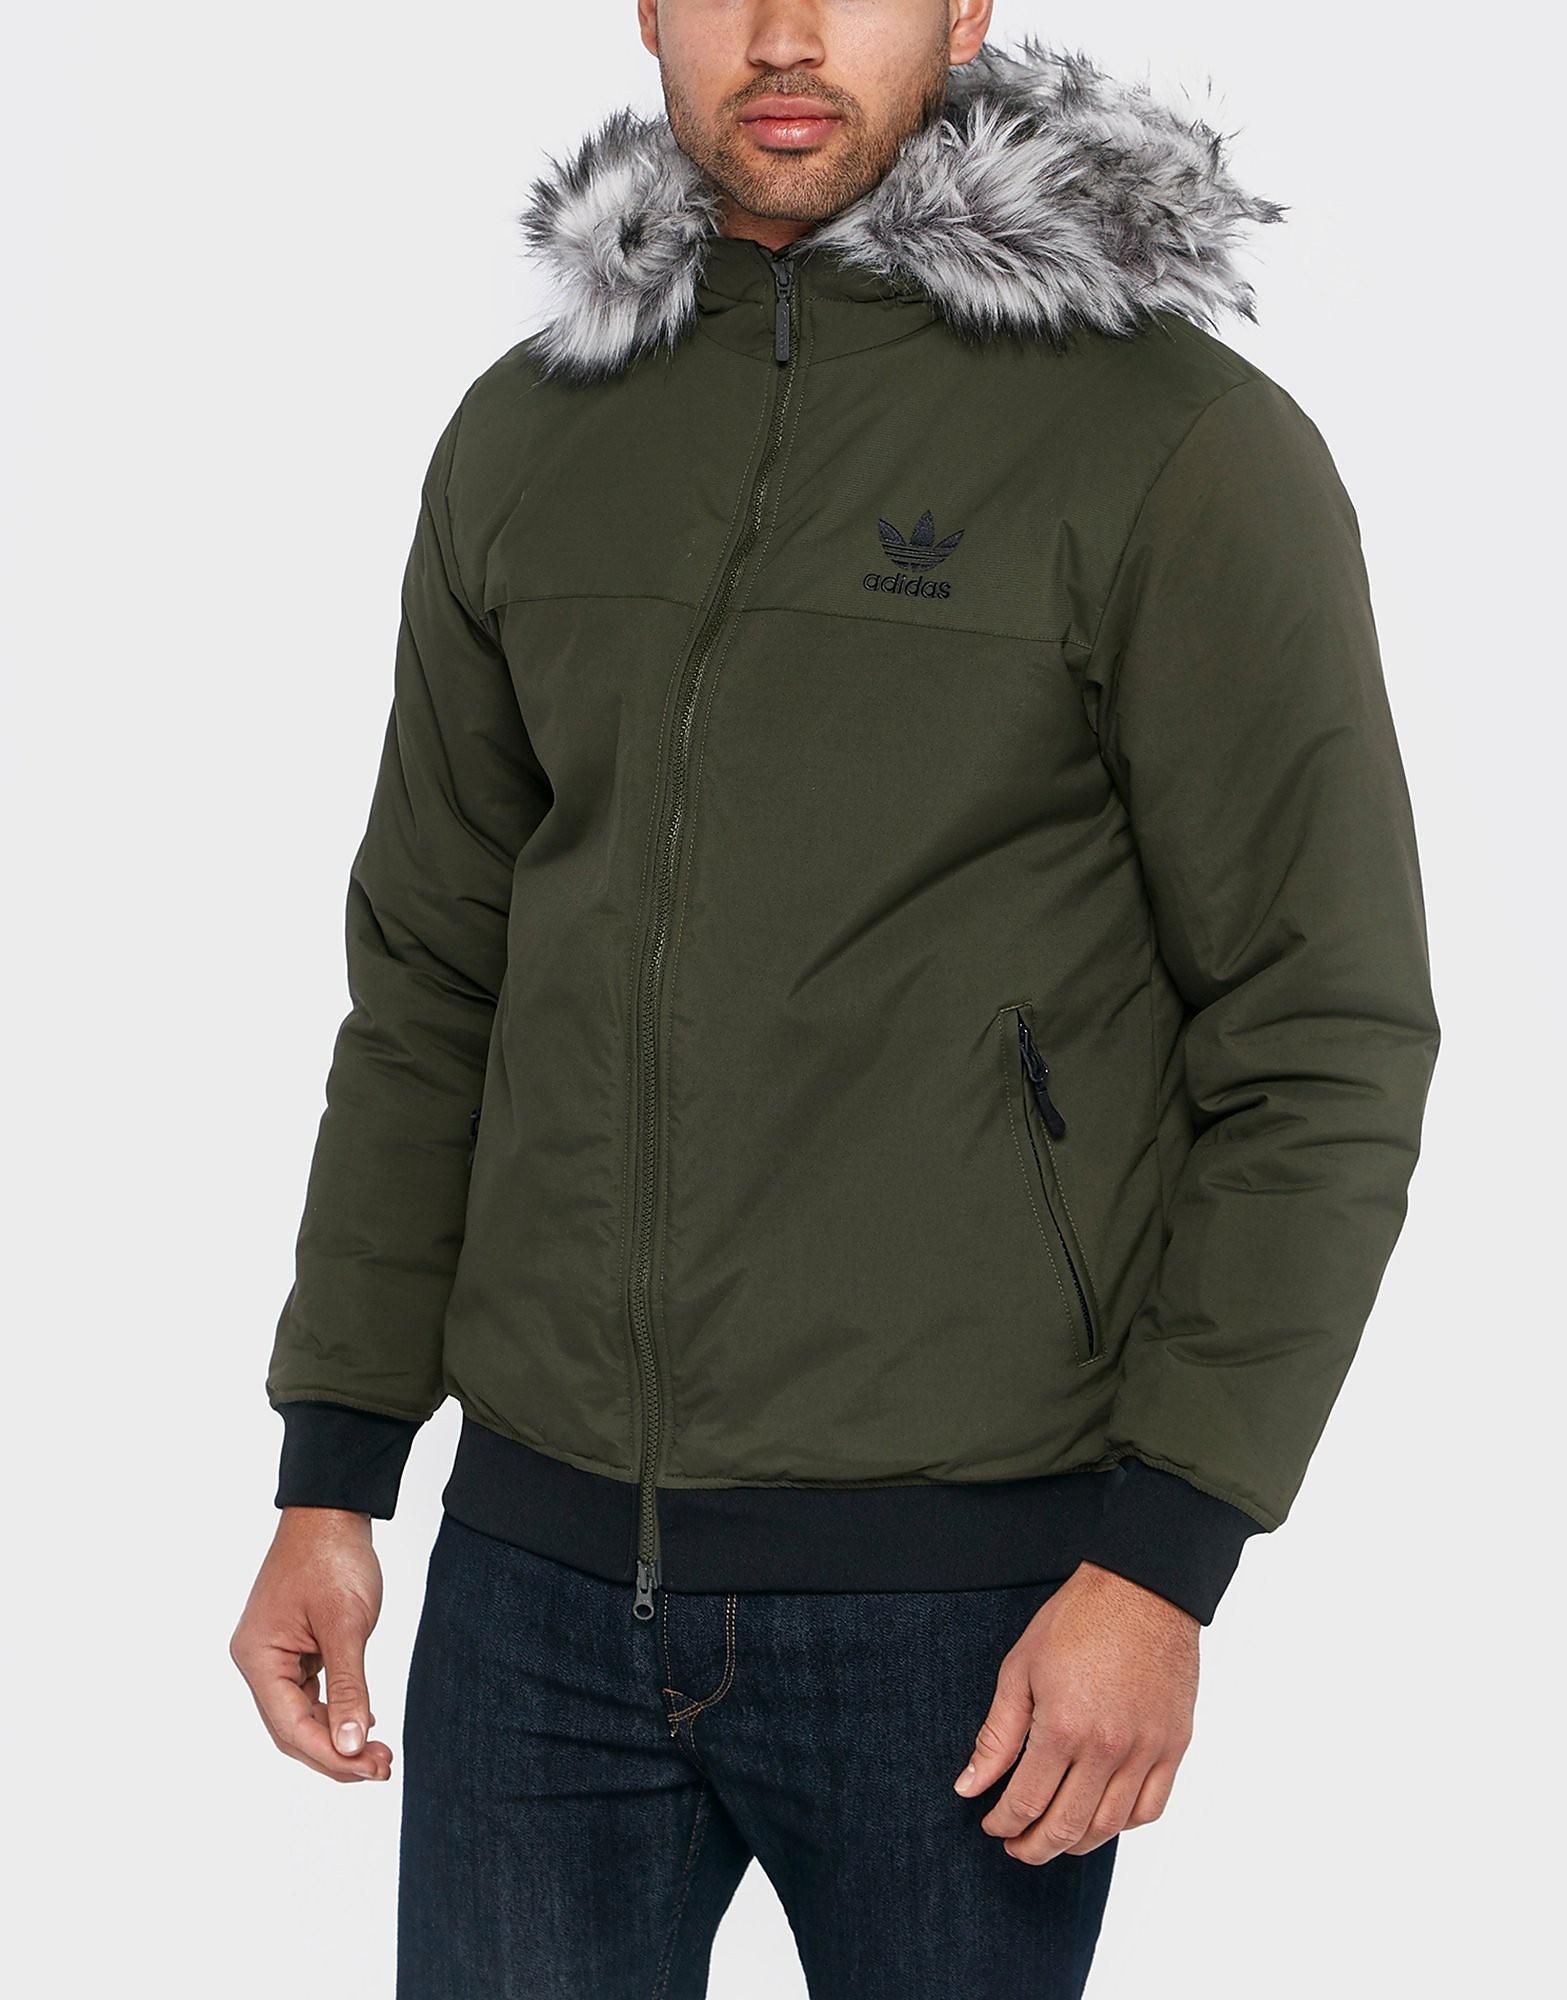 adidas Originals Trefoil Fur Parka Jacket  Khaki Khaki